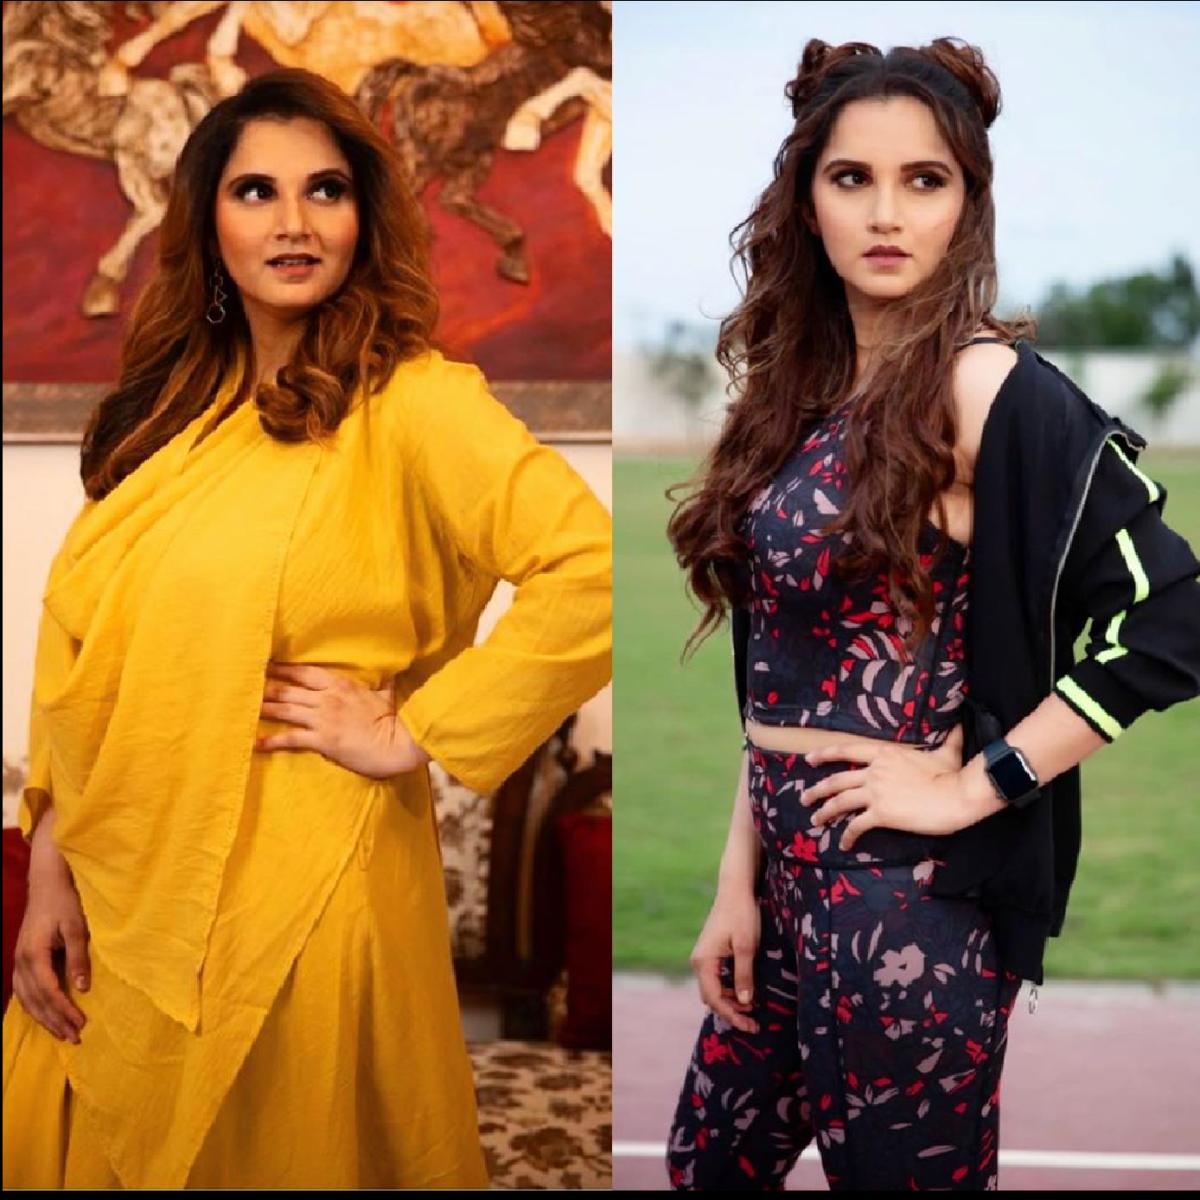 89 kilos vs 63 kilos: Sania Mirza shares photo of incredible transformation